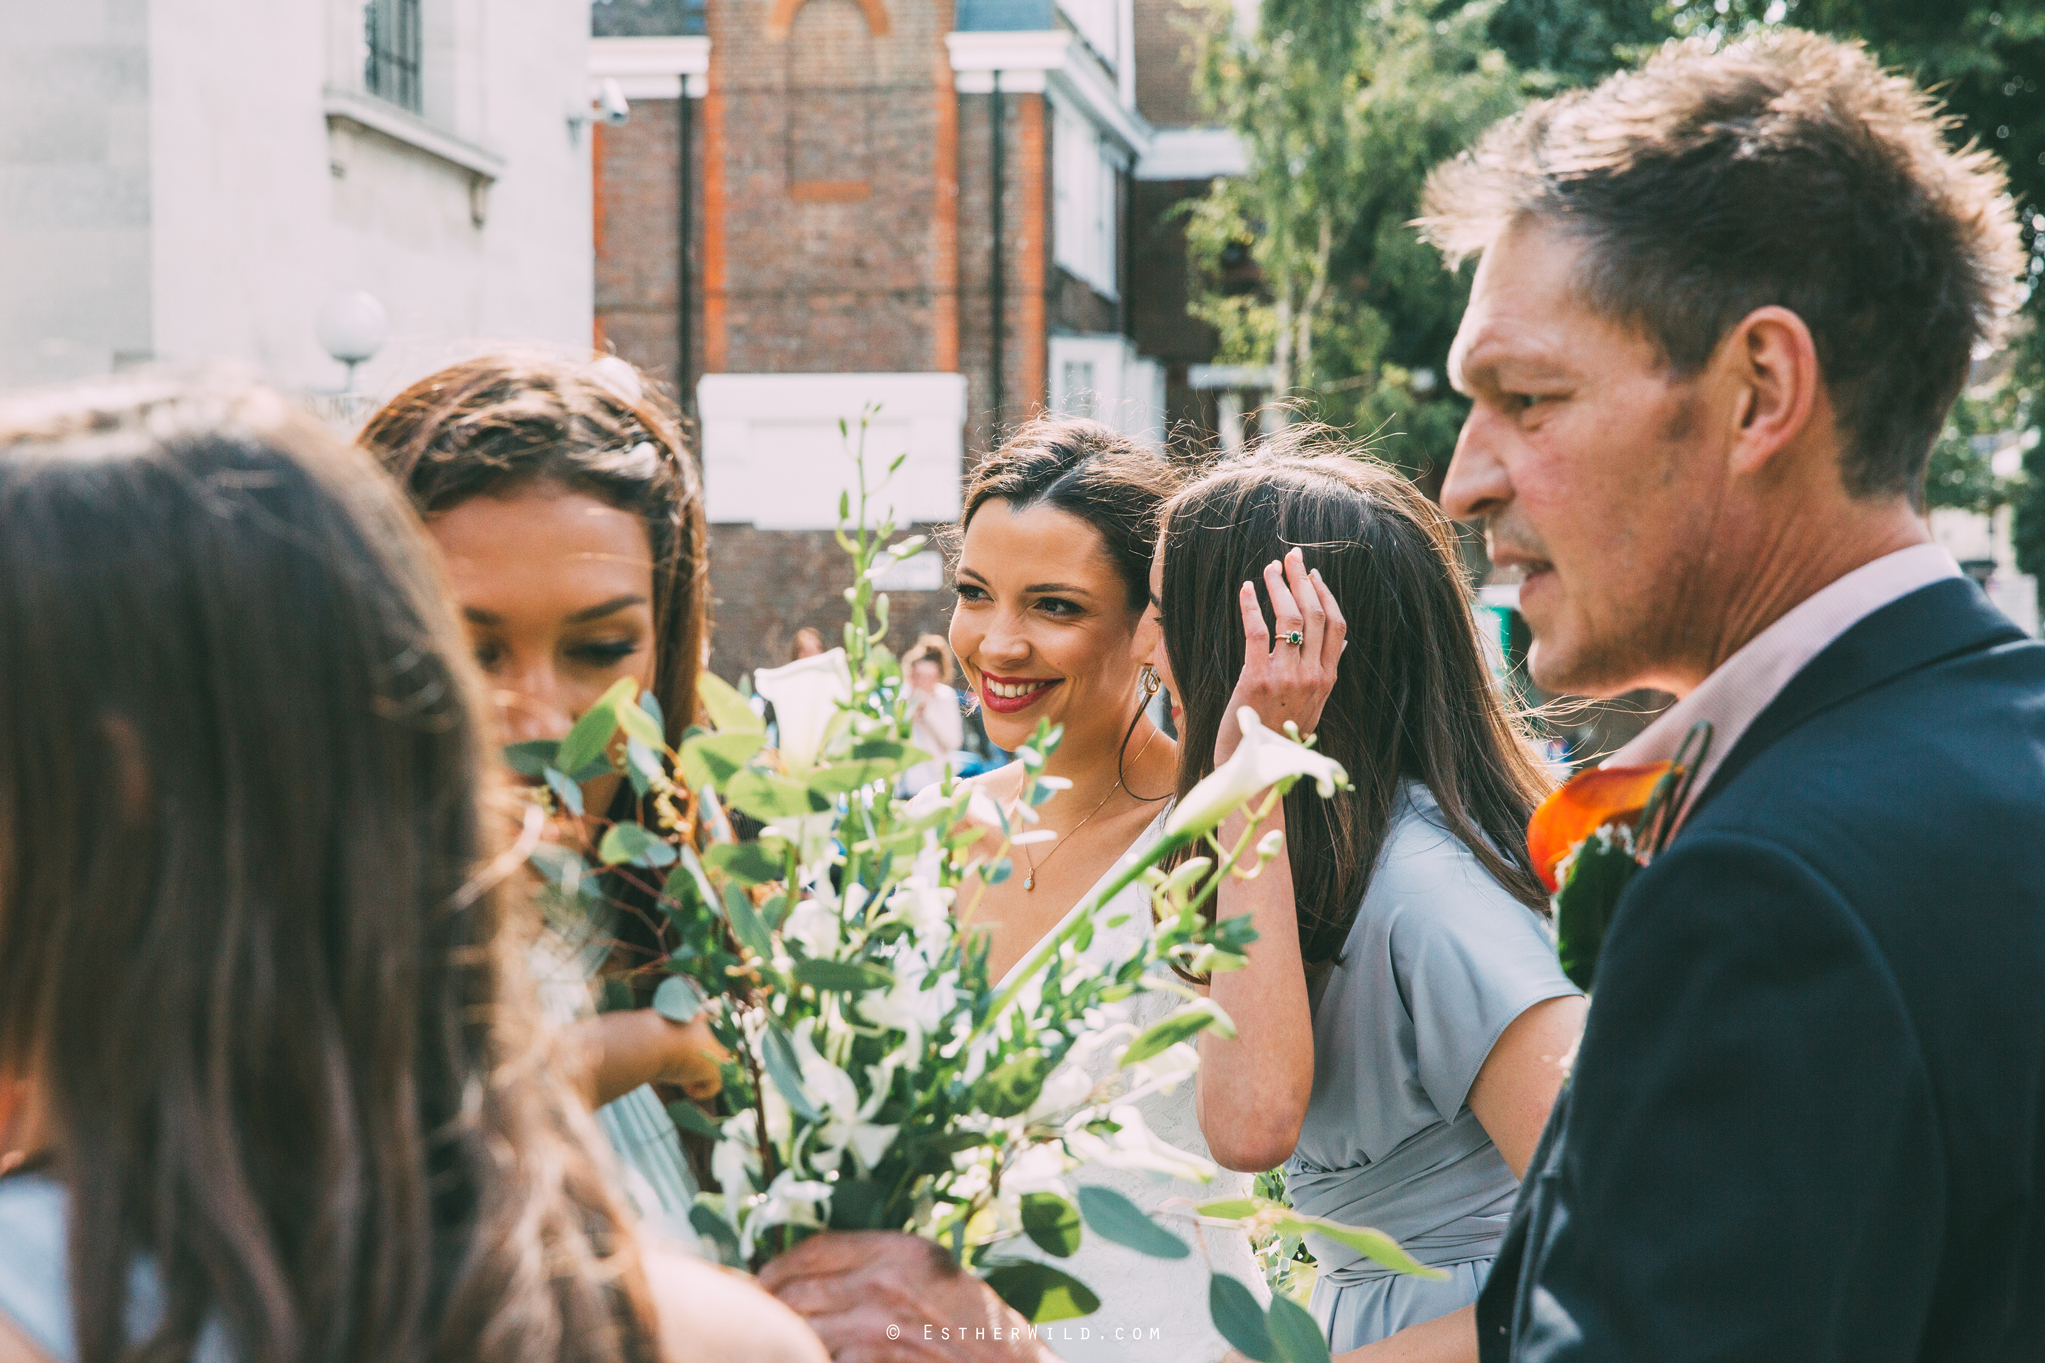 Islington_Town_Hall_Wedding_London_Photographer_Esther_Wild_IMG_4703.jpg